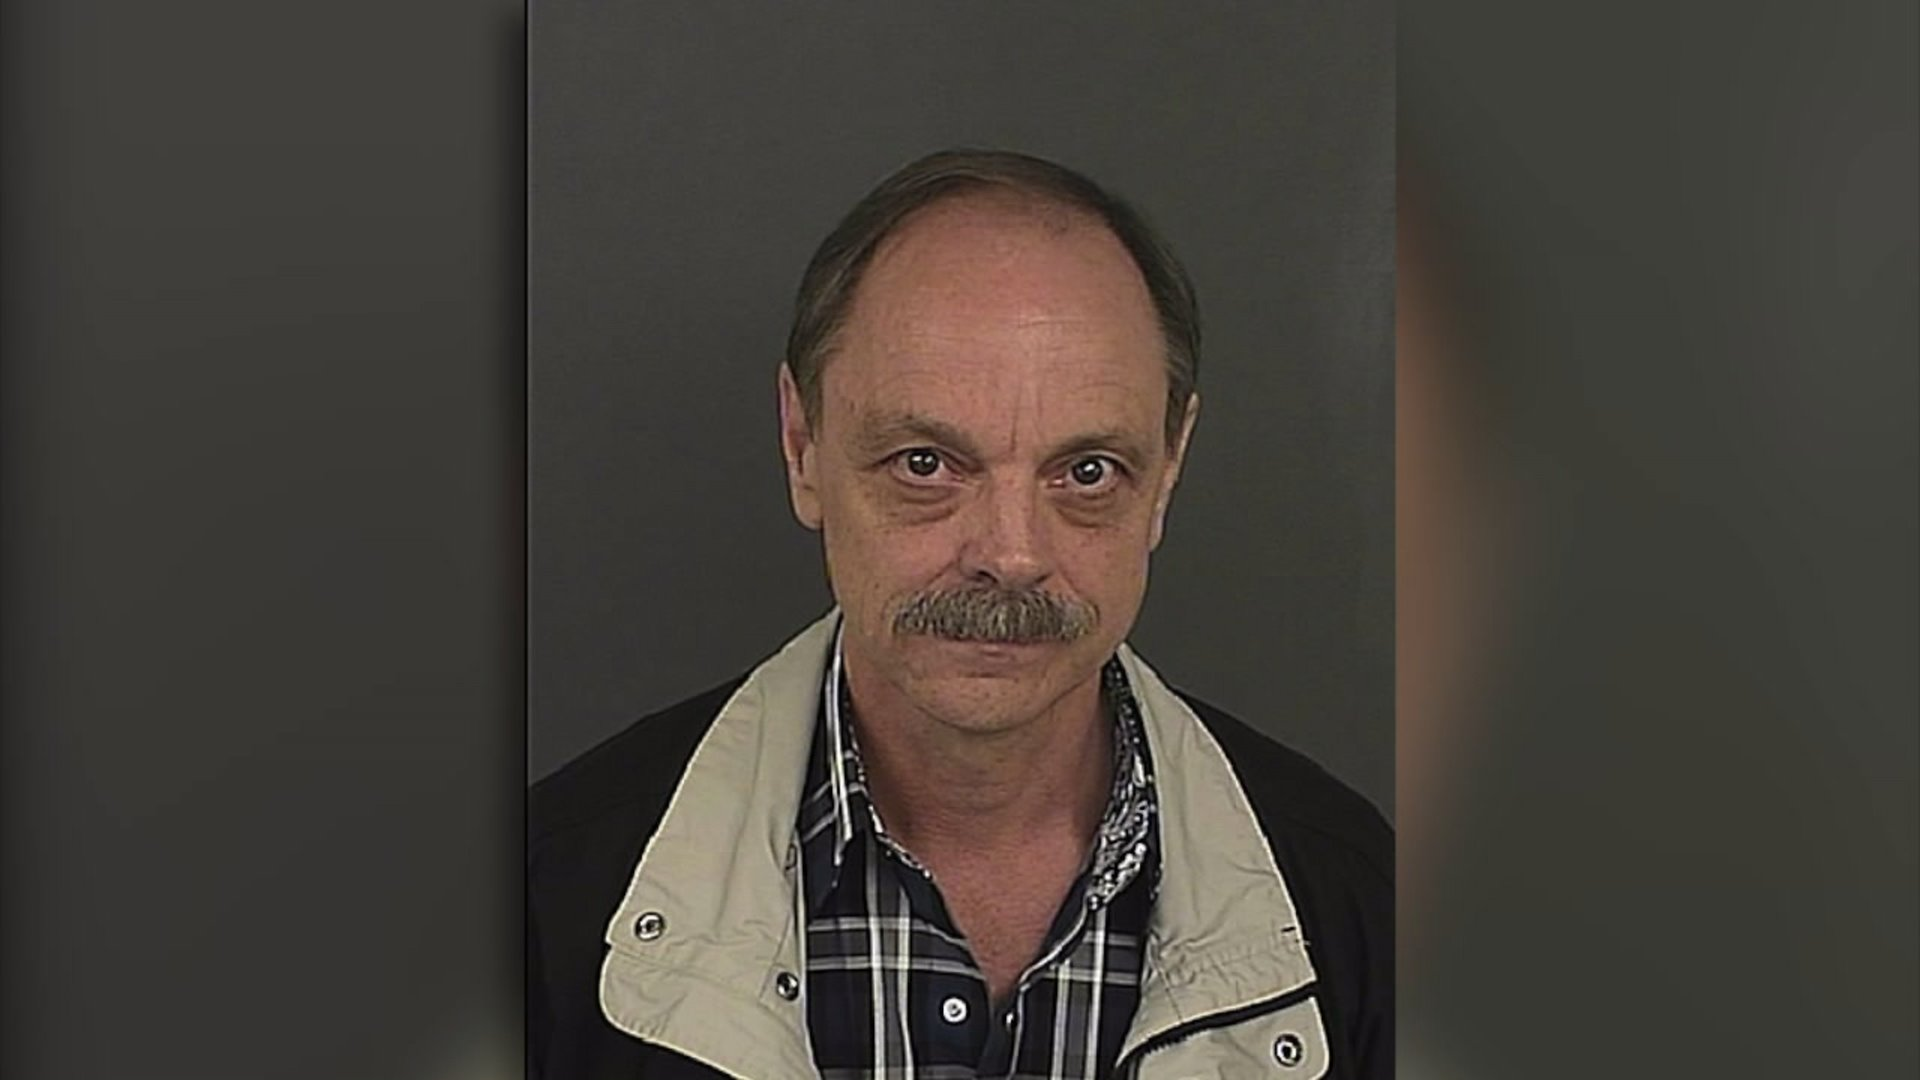 Denver man castrated transgender woman in apartment